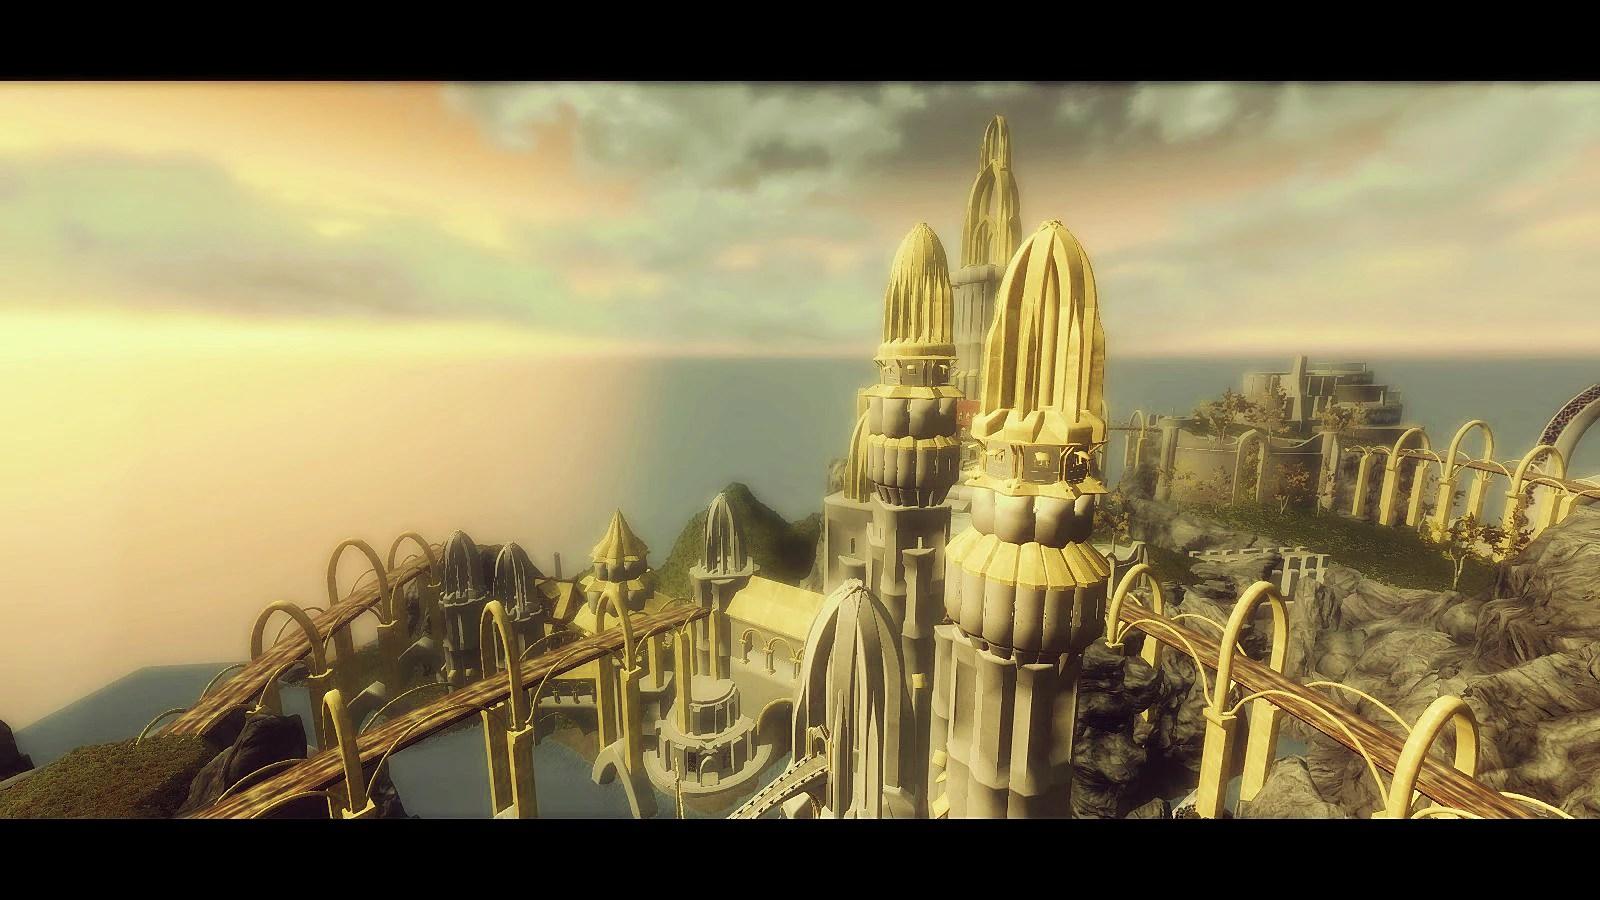 Cool Minecraft Wallpapers Hd The Enchanted City Of Biringan Steemit